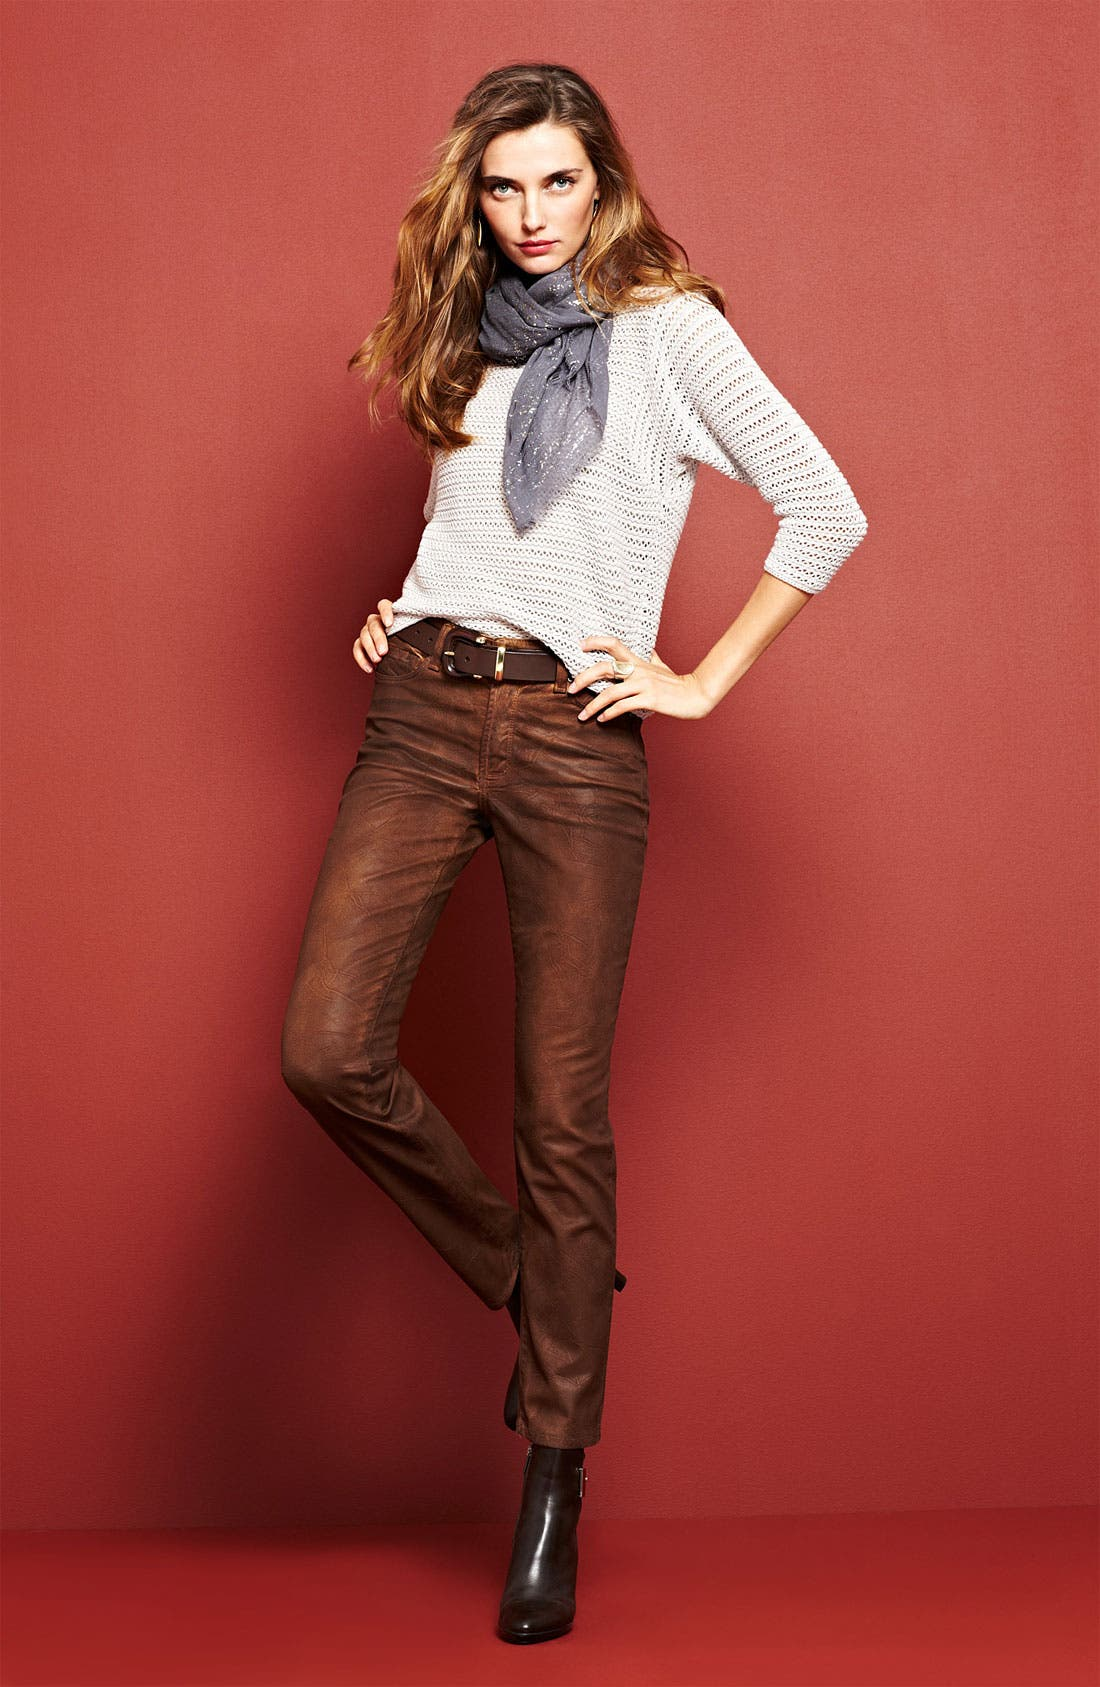 Main Image - Holistia Sweater & NYDJ 'Sheri' Coated Jeans